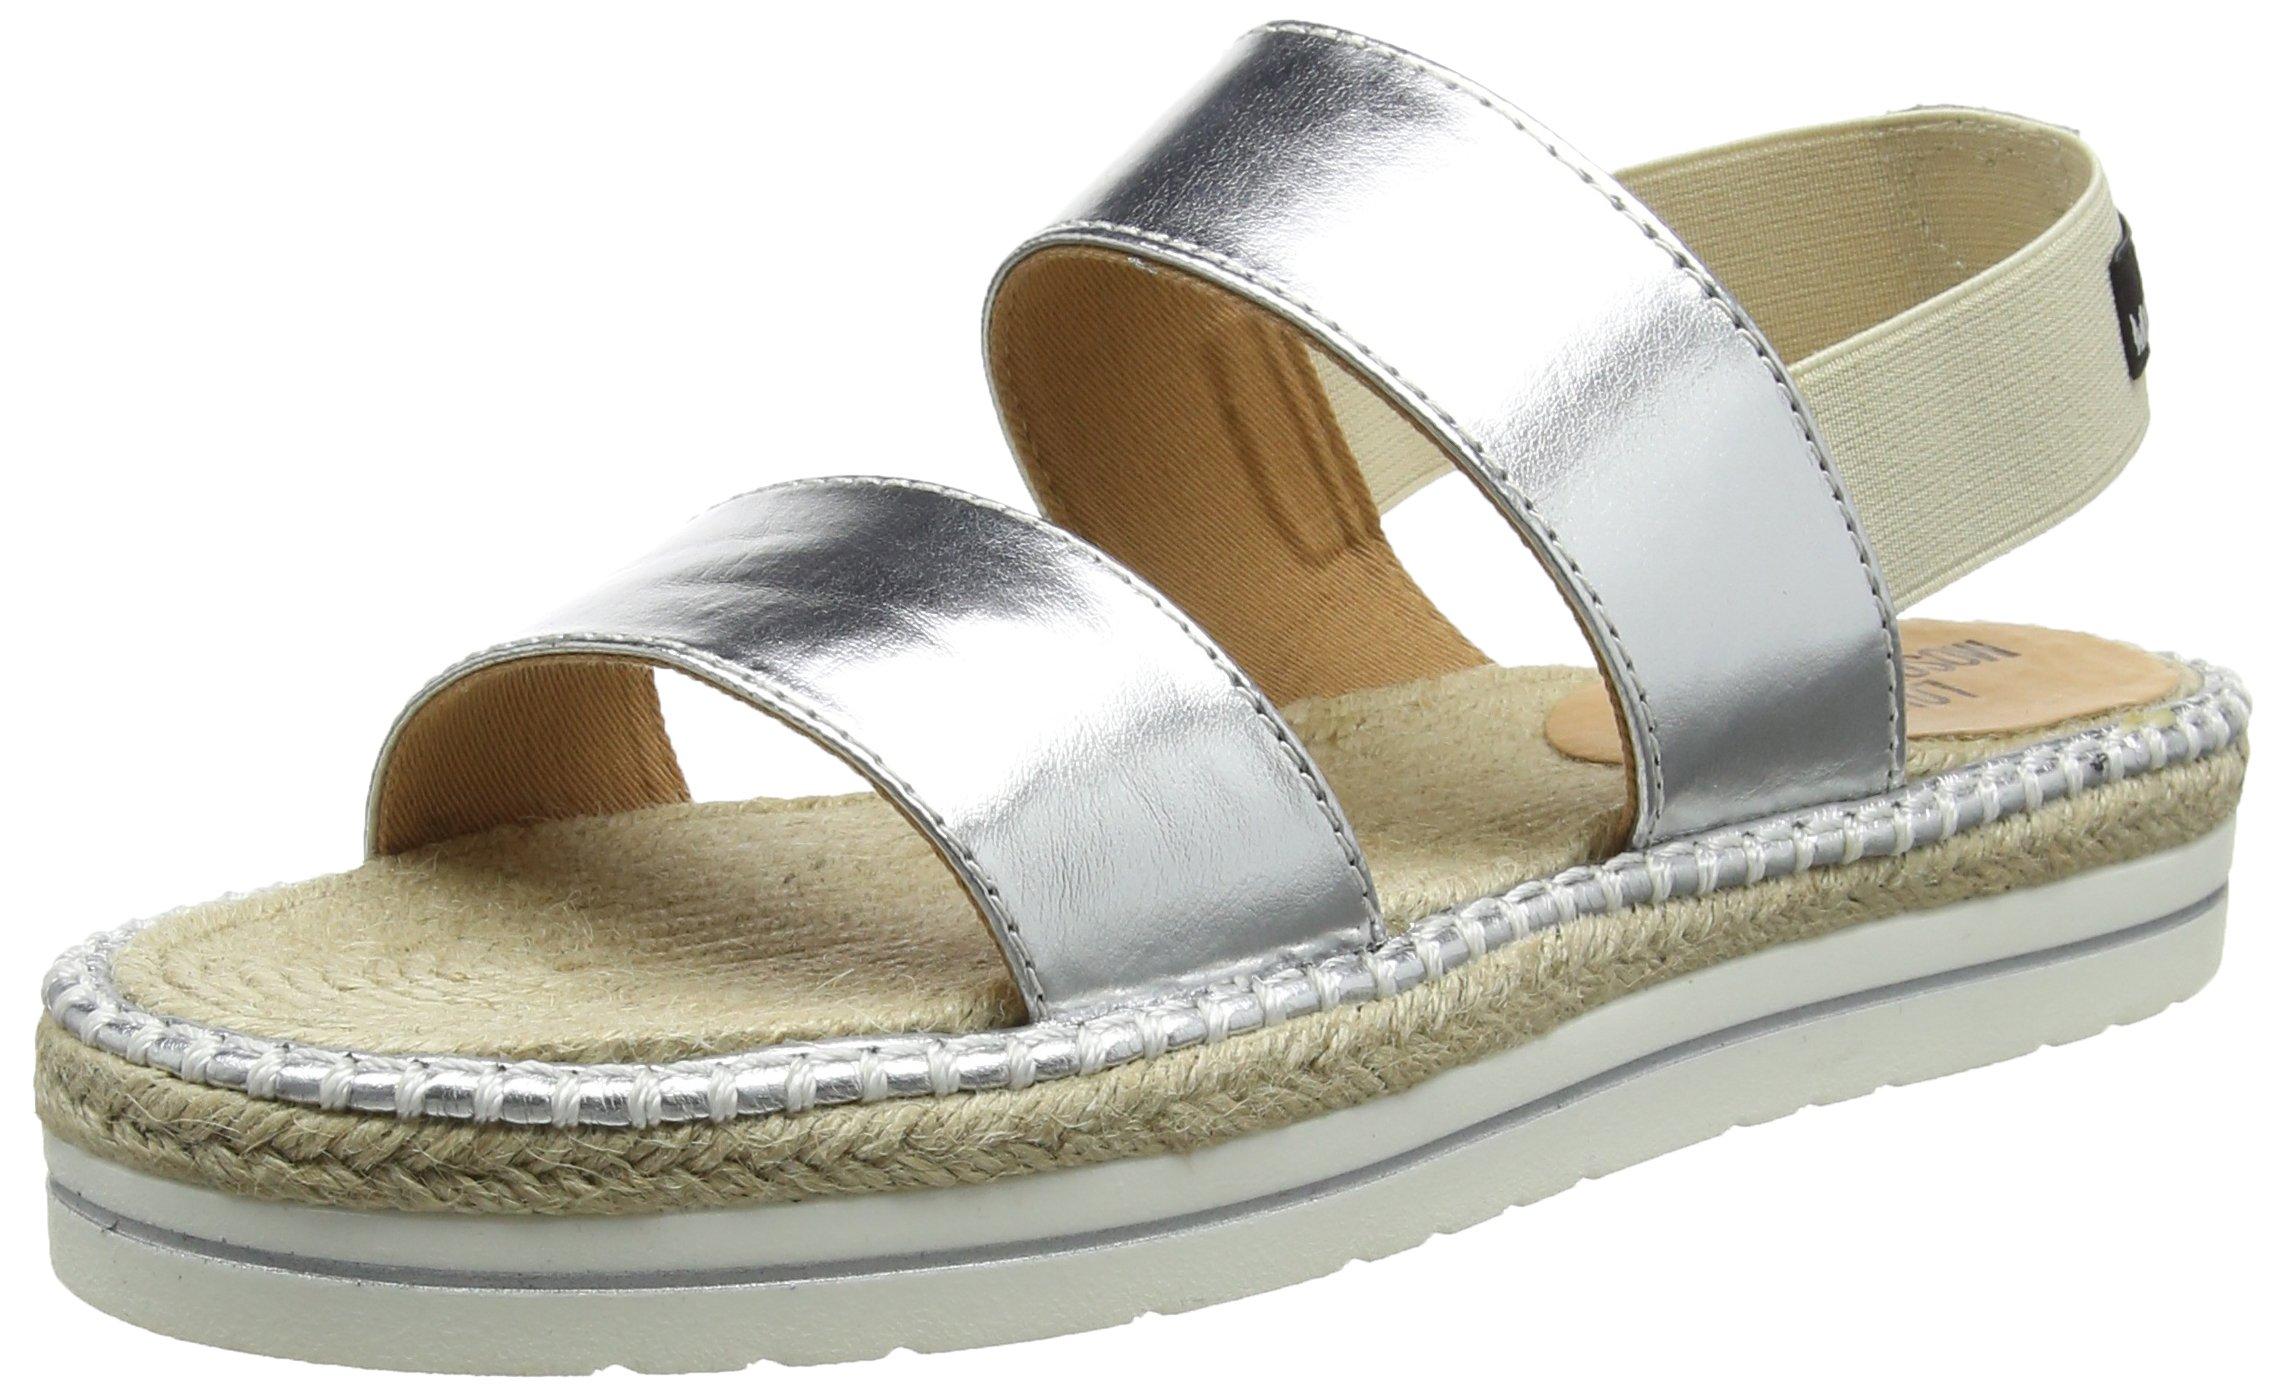 Love Moschino Women's Ja28052g03ja0700 Espadrille Sandal, Silver Lame PU, 37 EU/7 M US